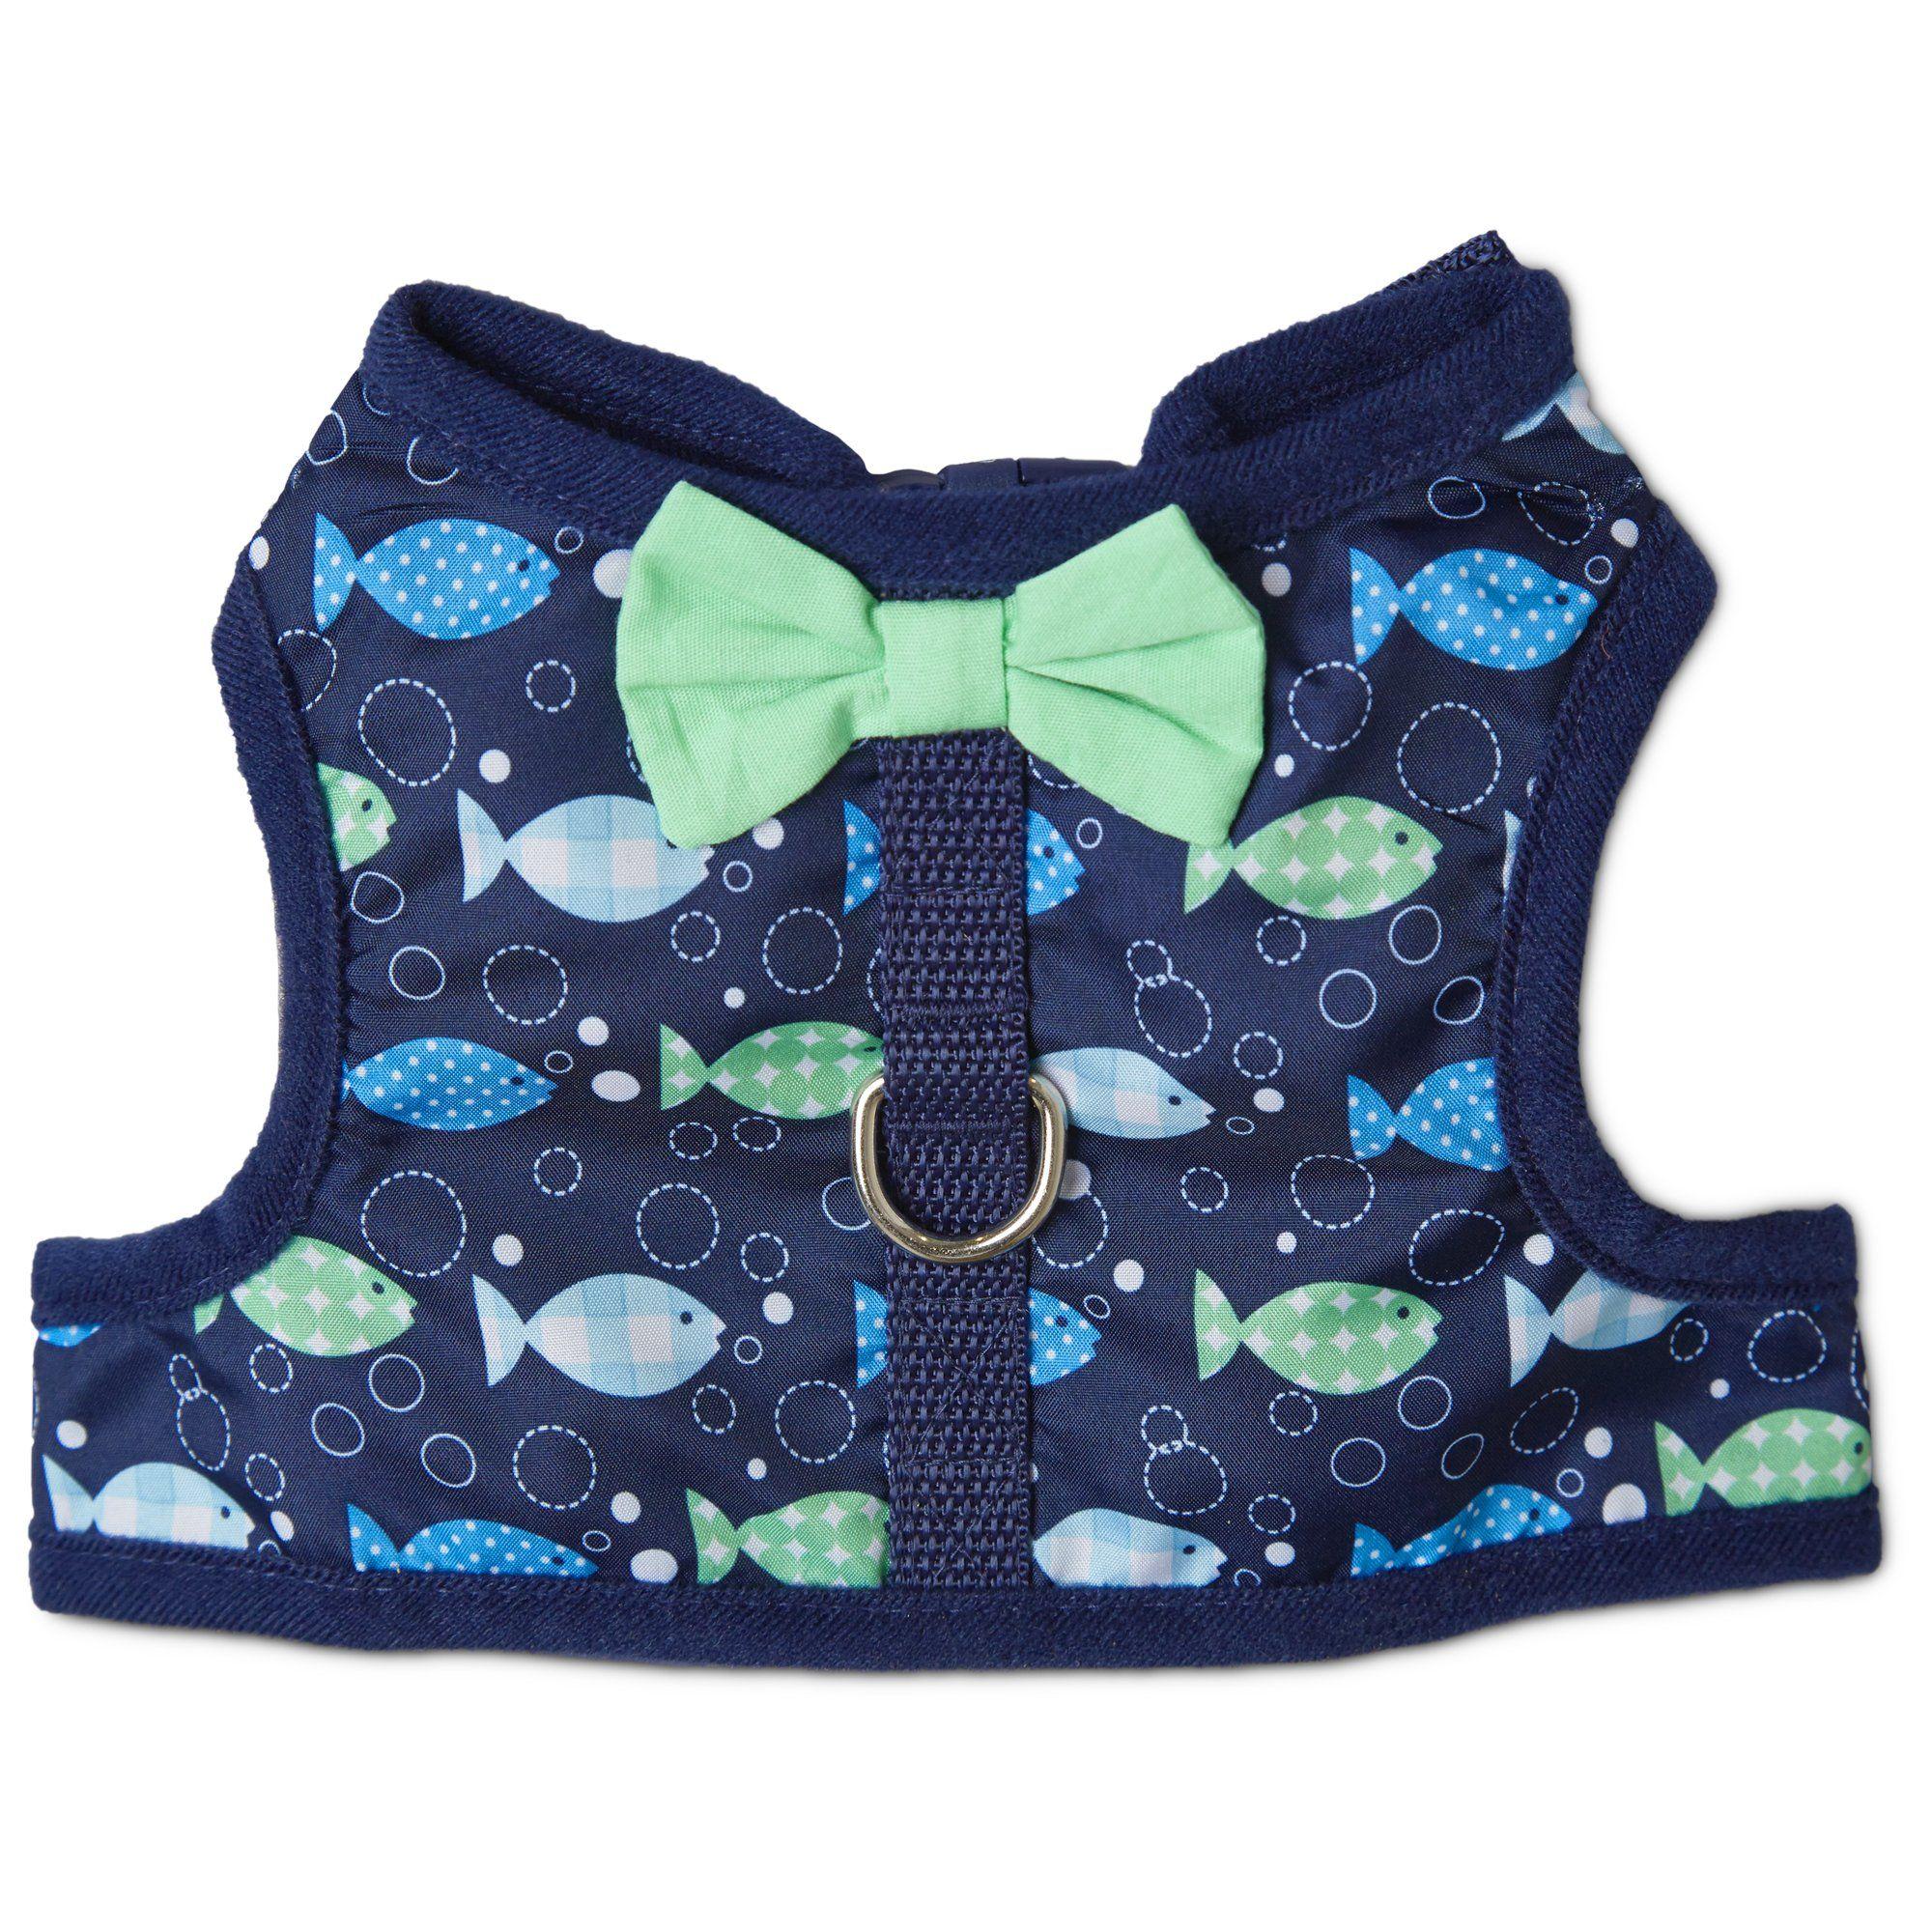 Bond Co Fishy Print Bow Tie Harness Petco Store Cat Harness Cat Clothes Cat Collars